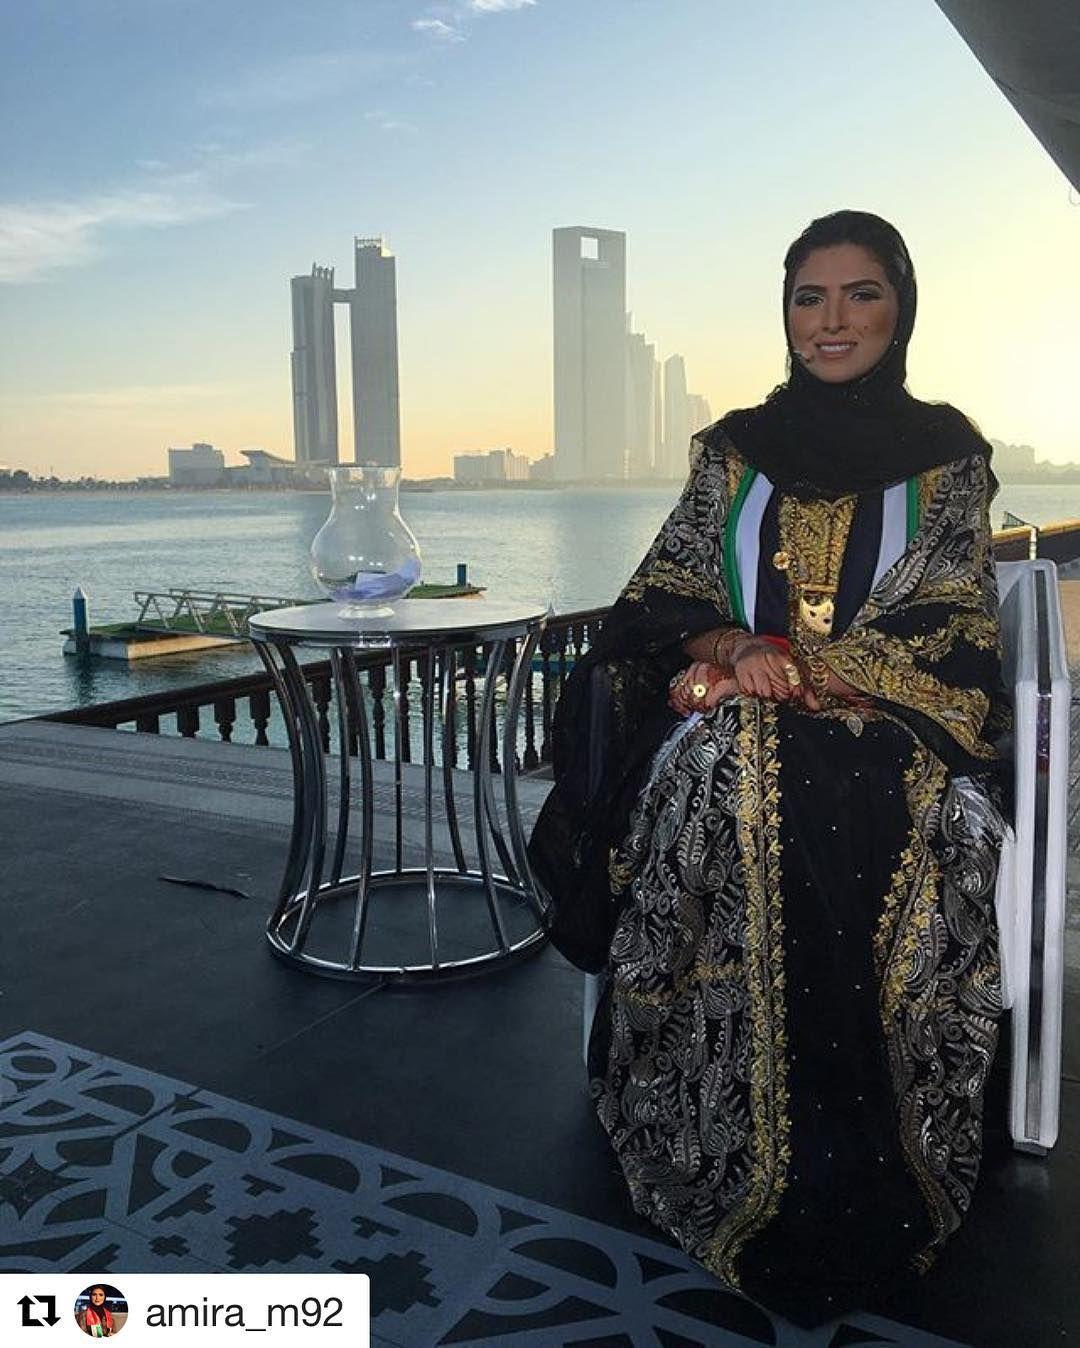 Subhan Abaya S Repost New Abaya Design Via Instagram Follow Us Subhanabayas Repost Amira M92 With Repostapp من عاصمة العز Abaya Designs Abaya Abaya Dubai